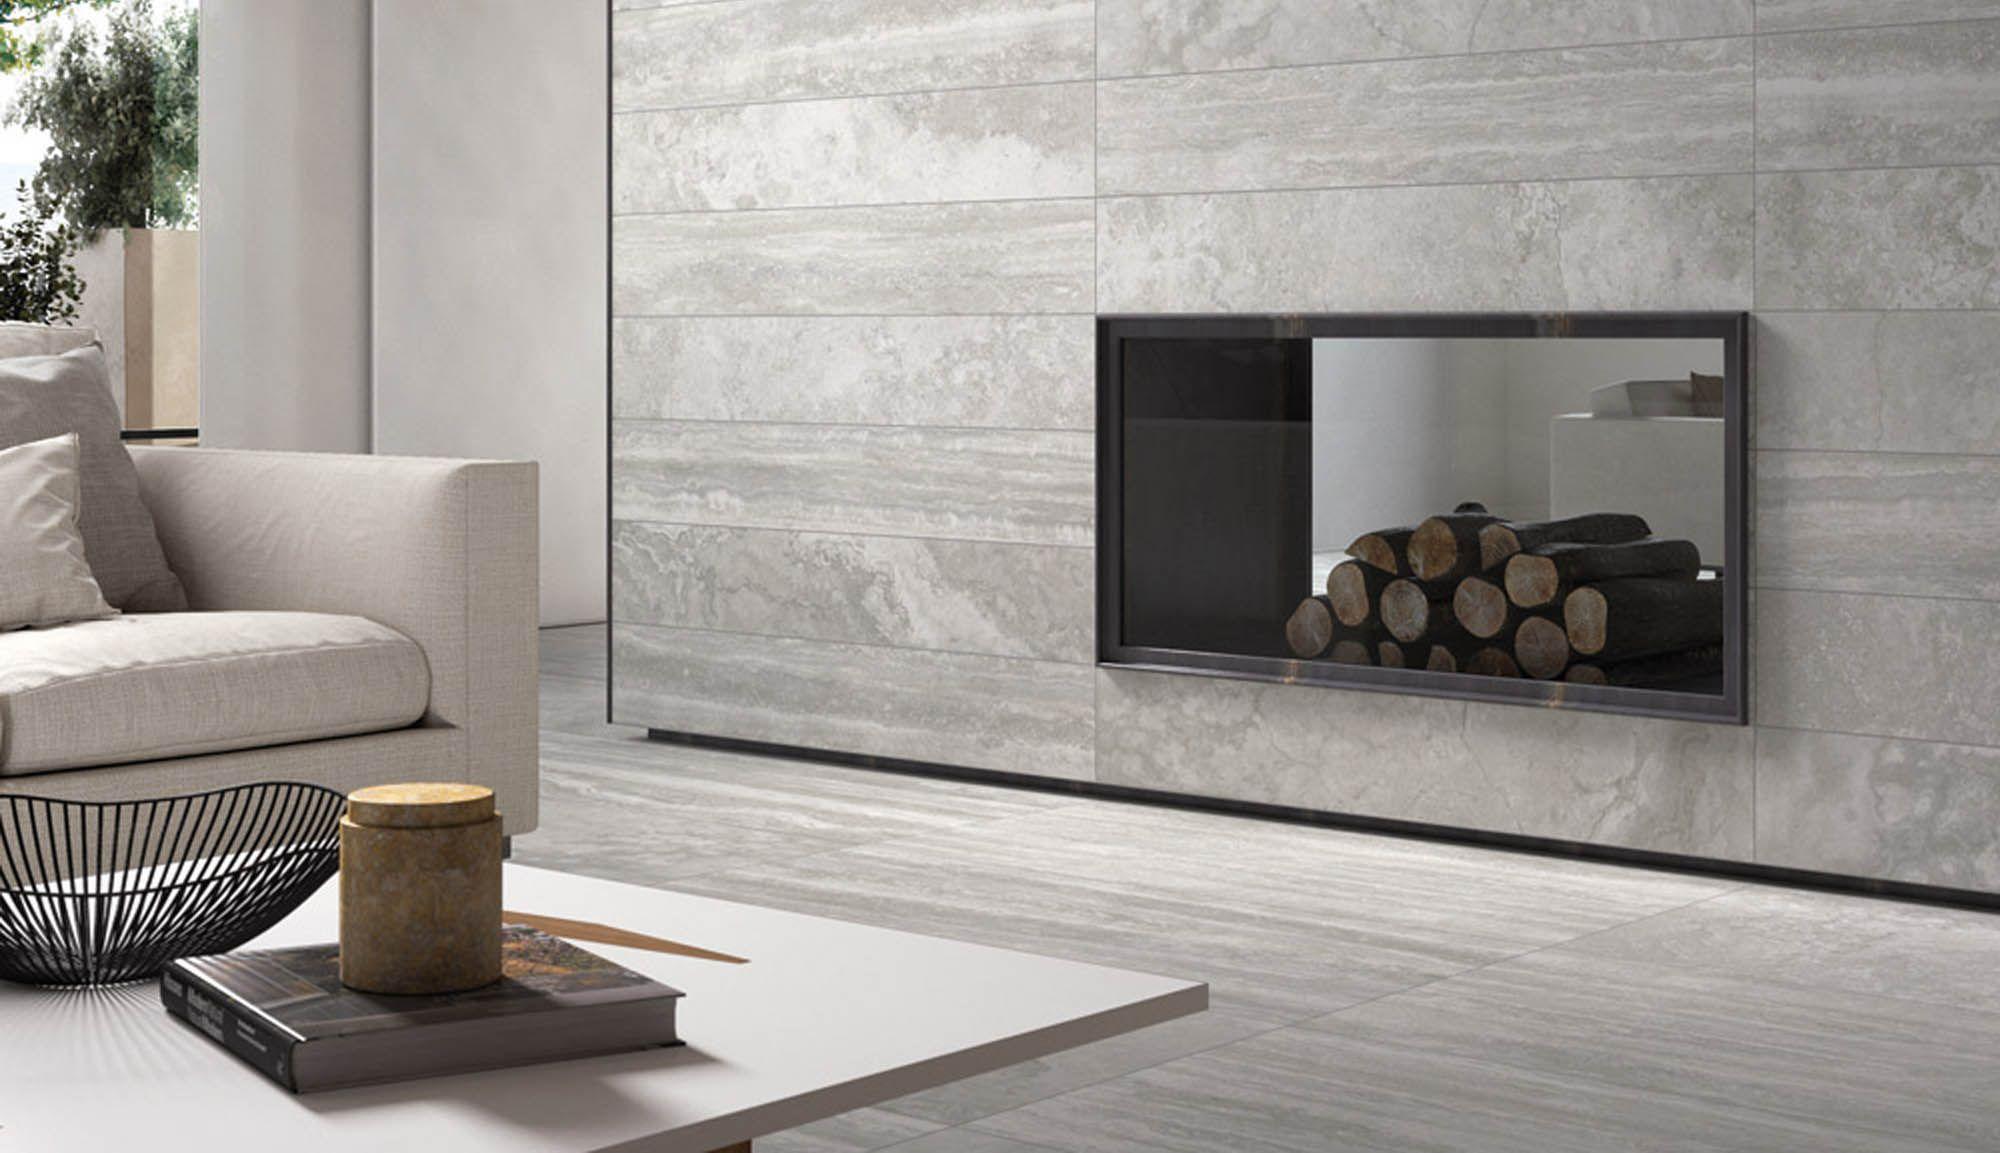 Large Format Tile Dolce Vita Floors Tiles Orlando Tile  # Muebles Dolce Vita